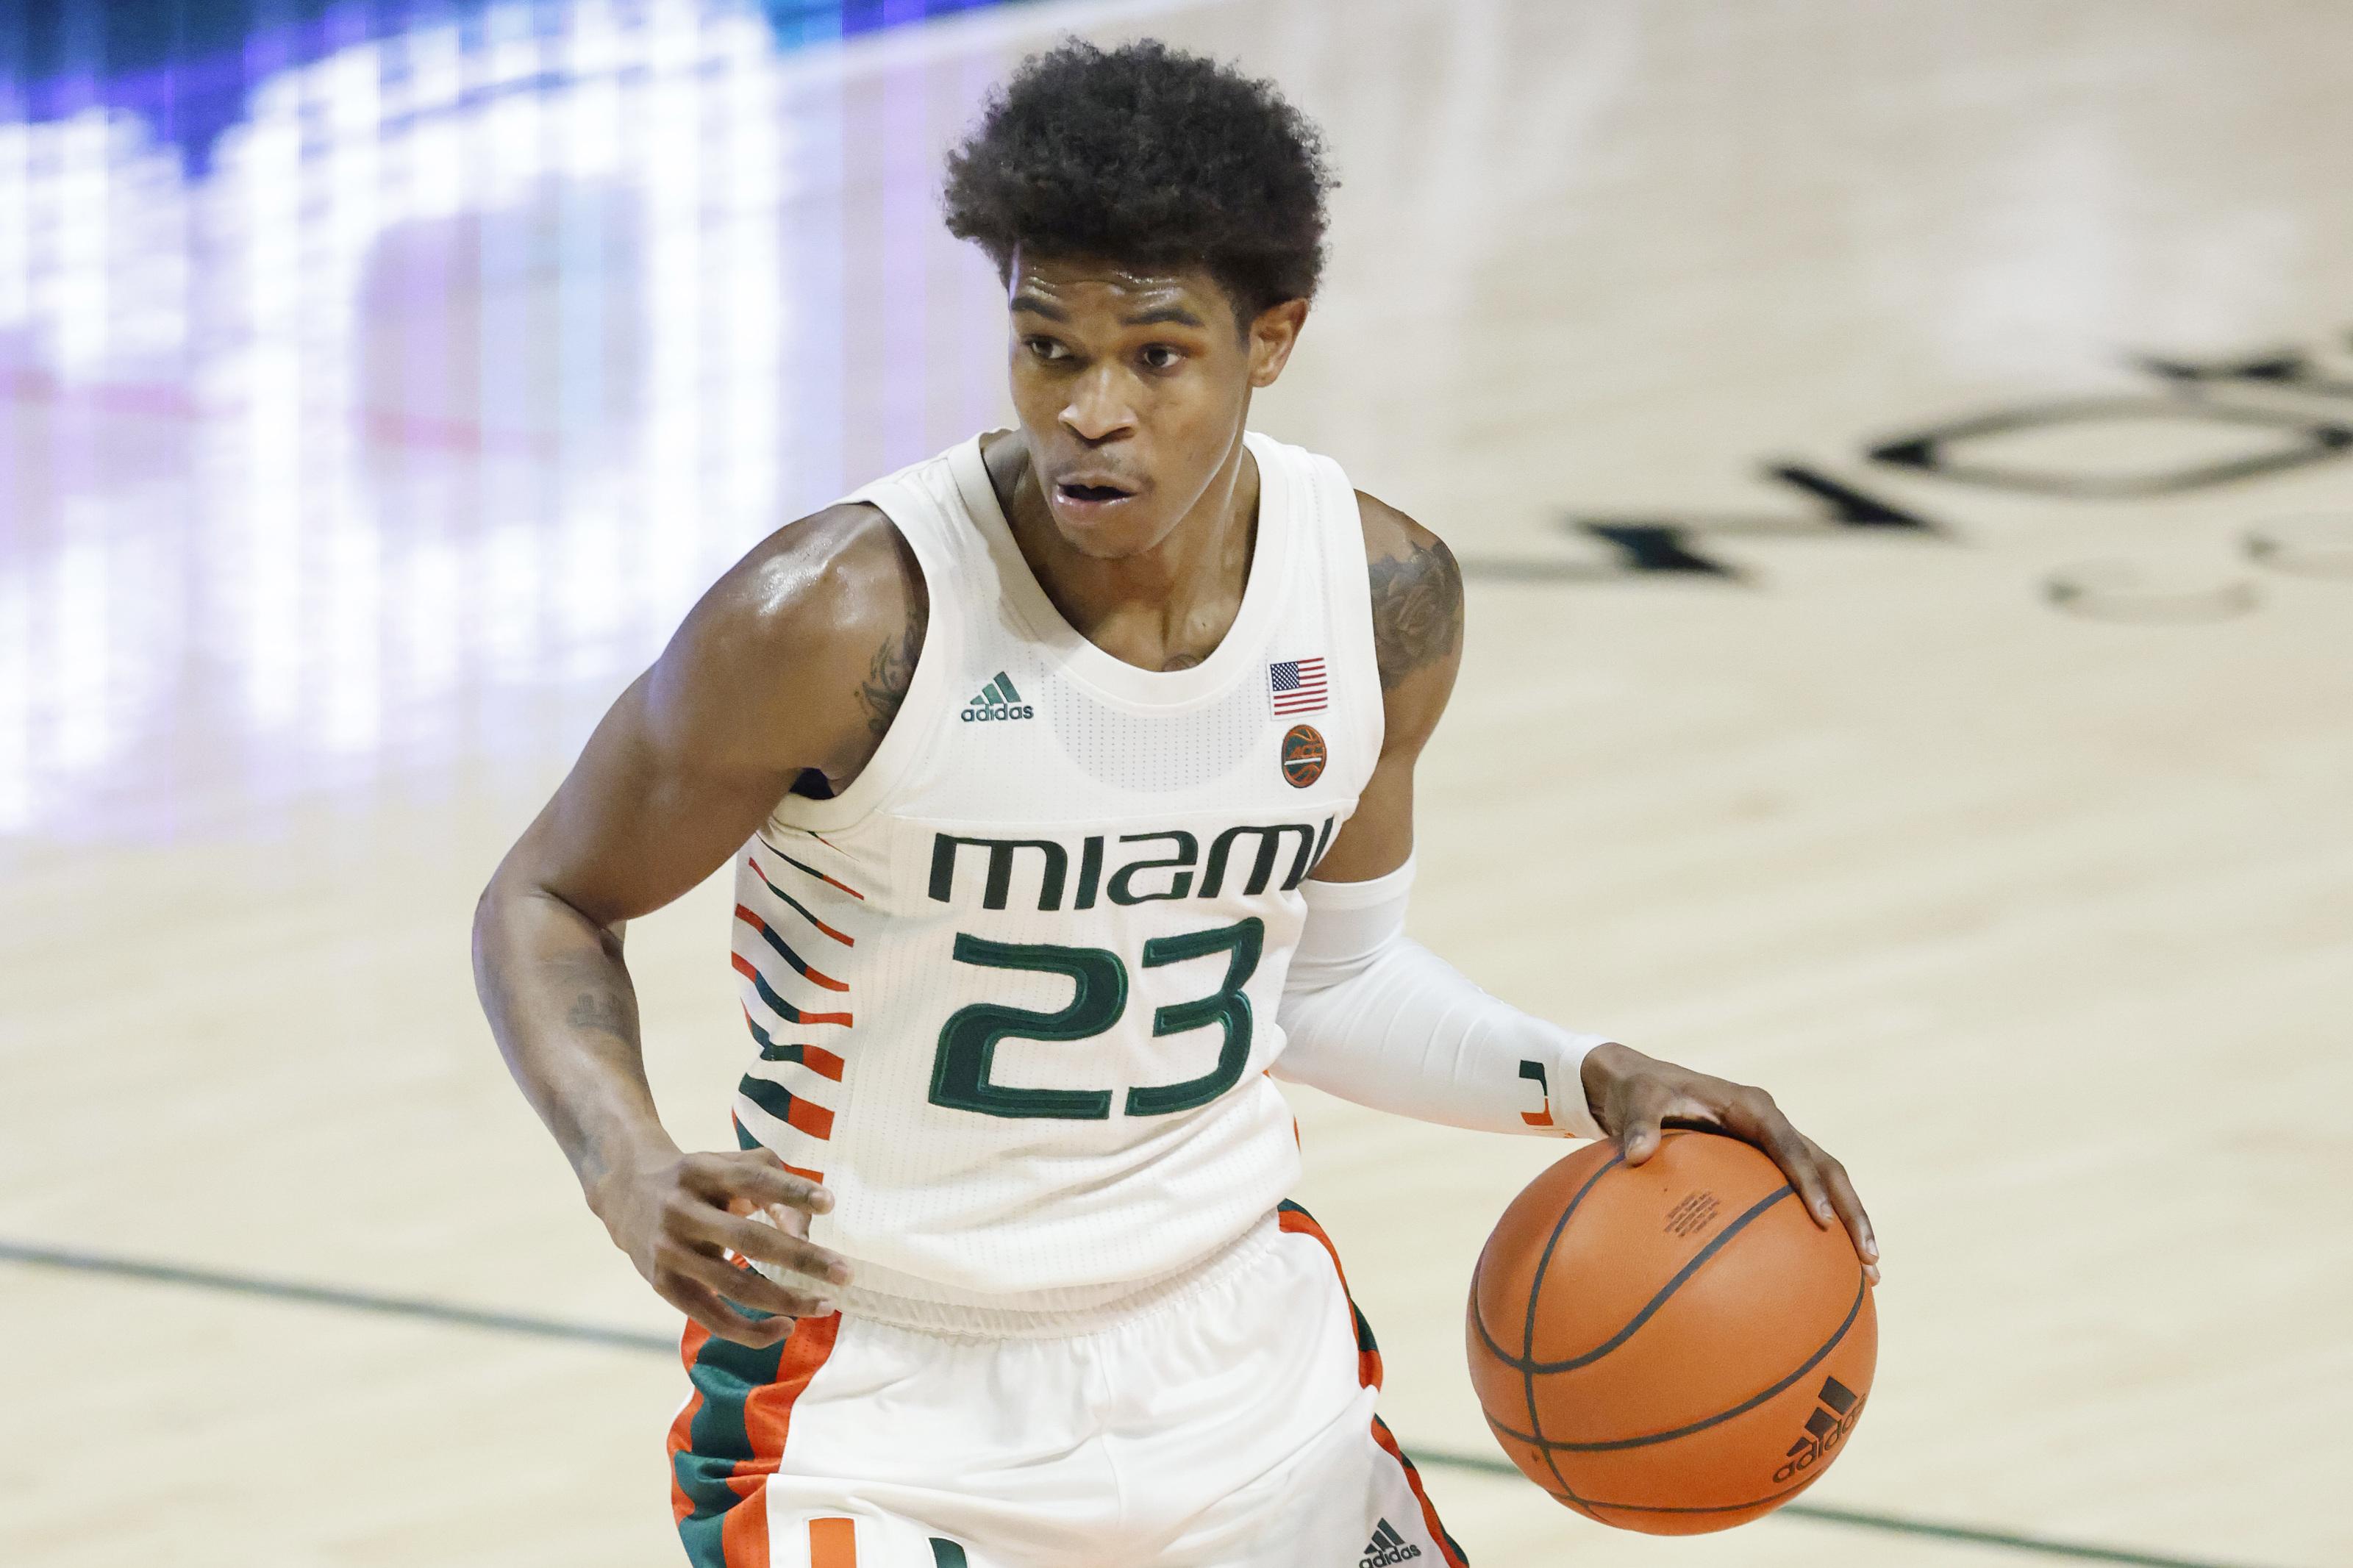 Chris Lykes Miami Hurricanes Basketball Jersey - Orange